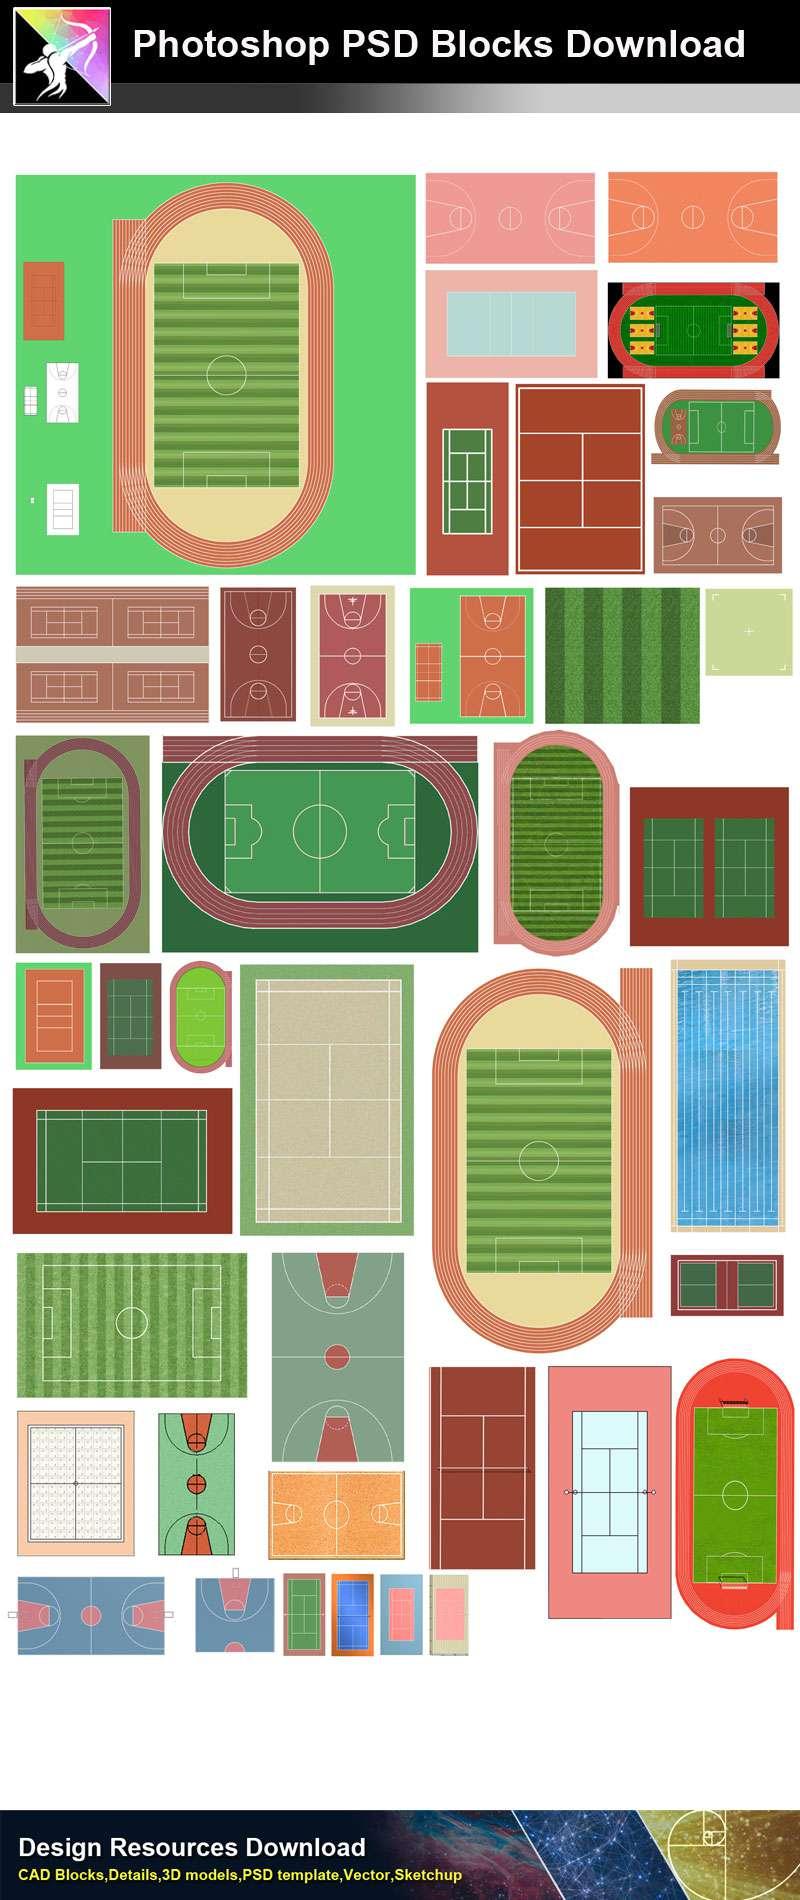 basketball court psd ★【psd landscape layout design blocks 】playground, gymnasium, basketball  court psd landscape blocks